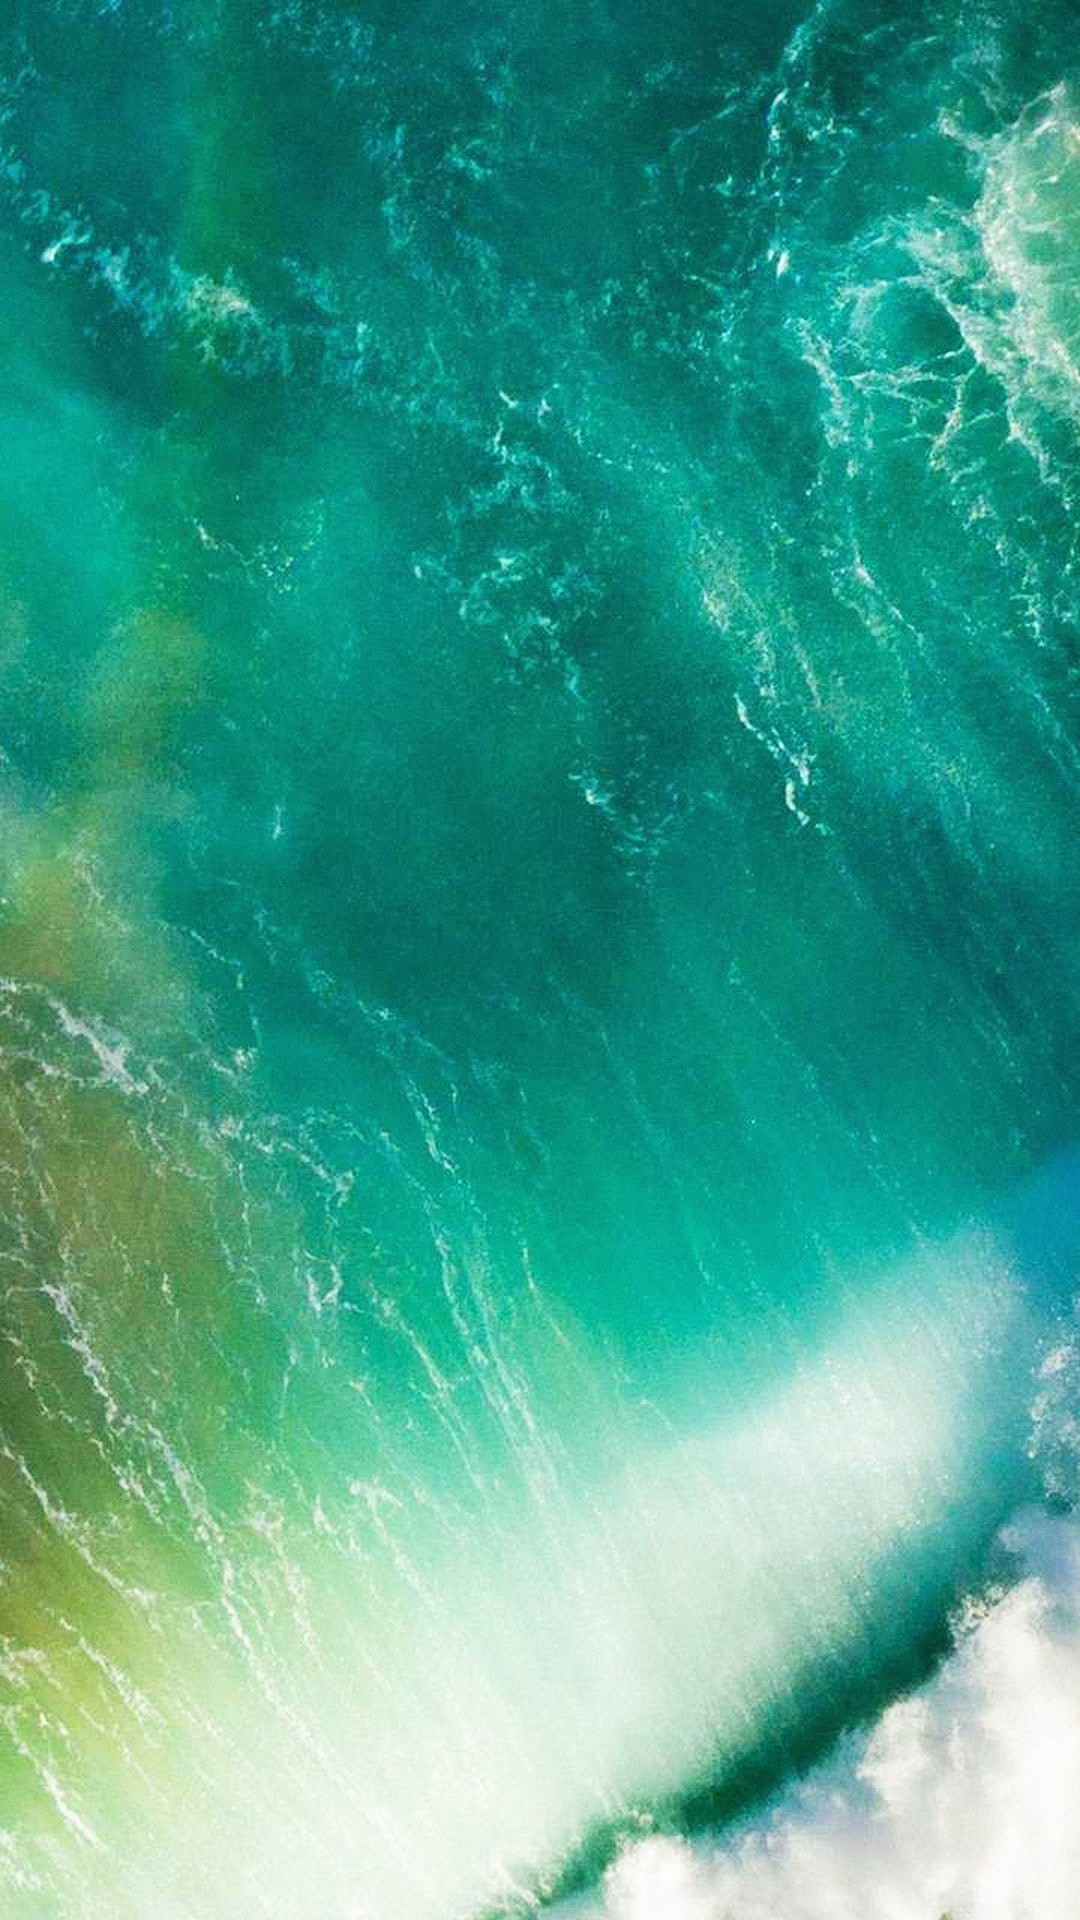 Wallpaper Apple, IOS 10, 4k, 5k, Iphone Wallpaper, Live